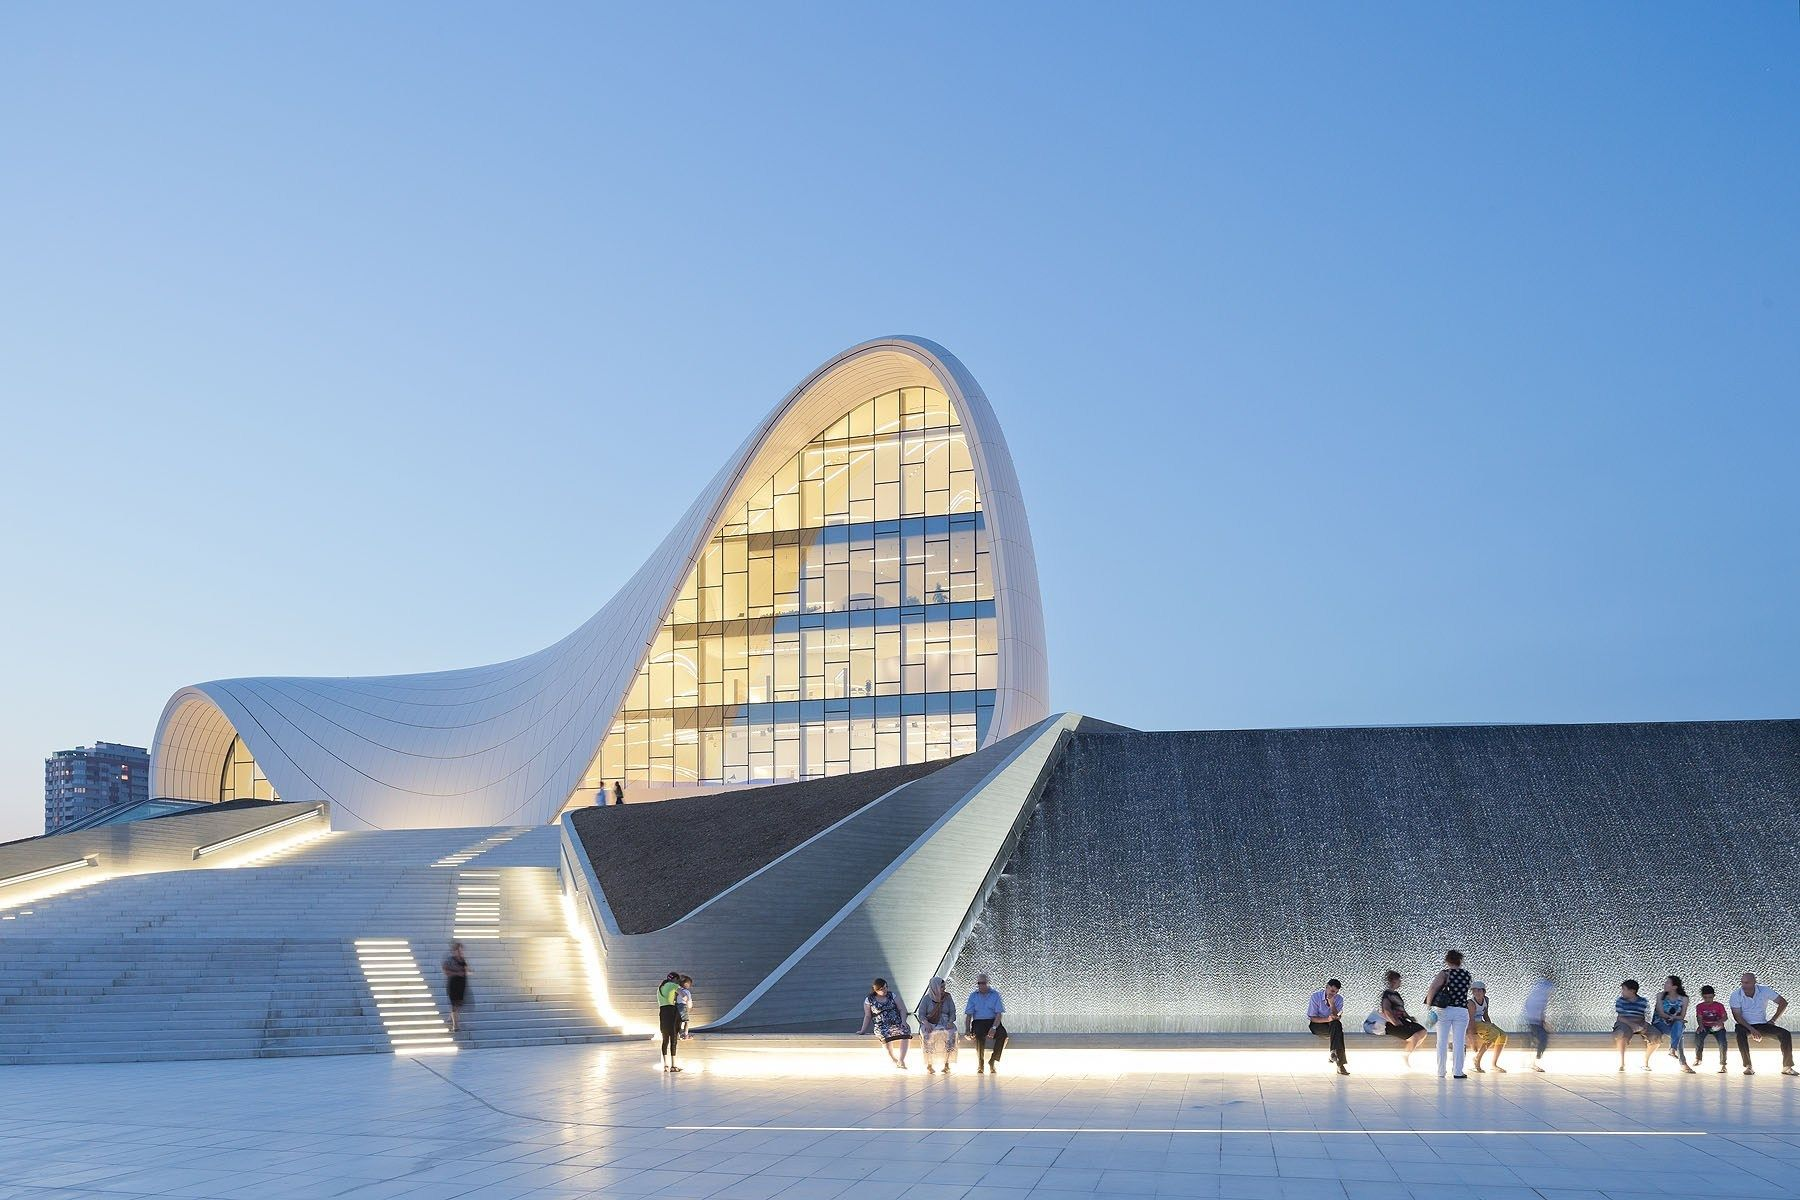 Heydar Aliyev Centre Baku Azerbaijan Zaha Hadid Architects Iwan Baan Zaha Hadid Architecture Zaha Hadid Design Zaha Hadid